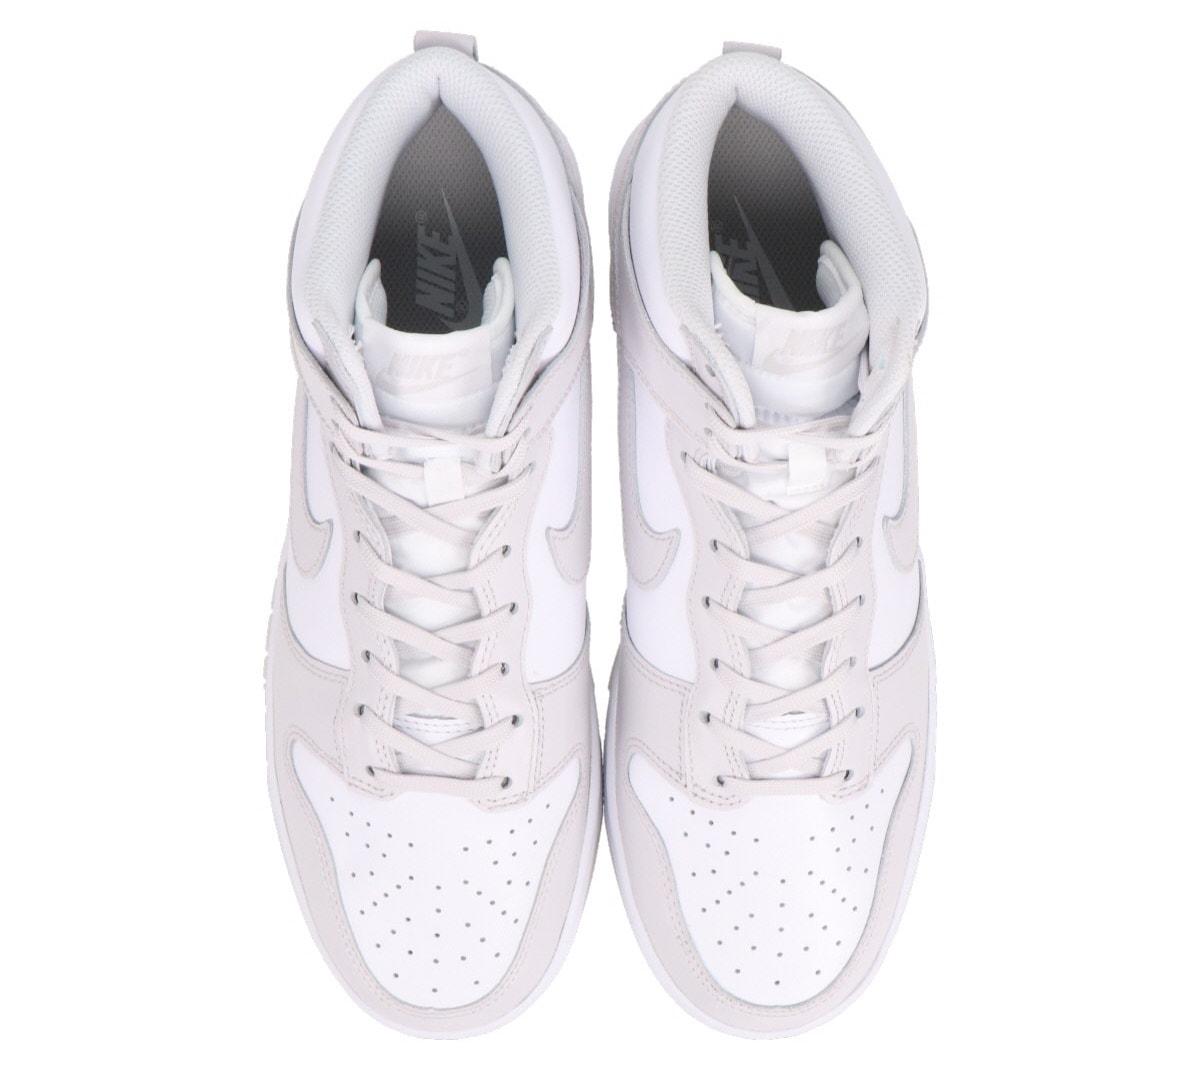 Nike Dunk High Vast Grey DD1399-100 Release Info